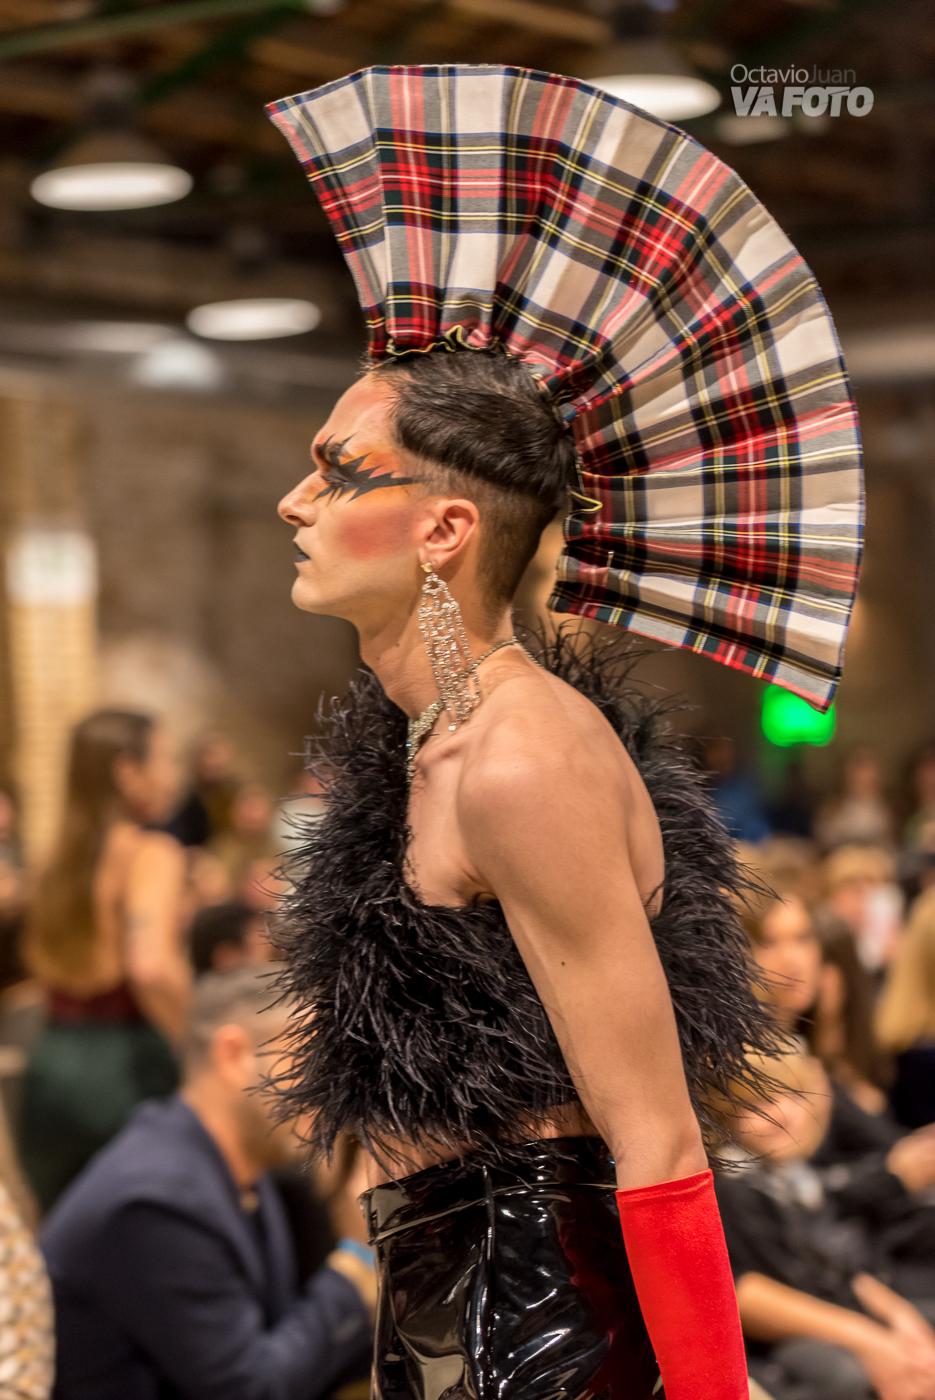 00127 ARTEMODA DSC4226 20181124 - Evento: Arte + Moda Valencia